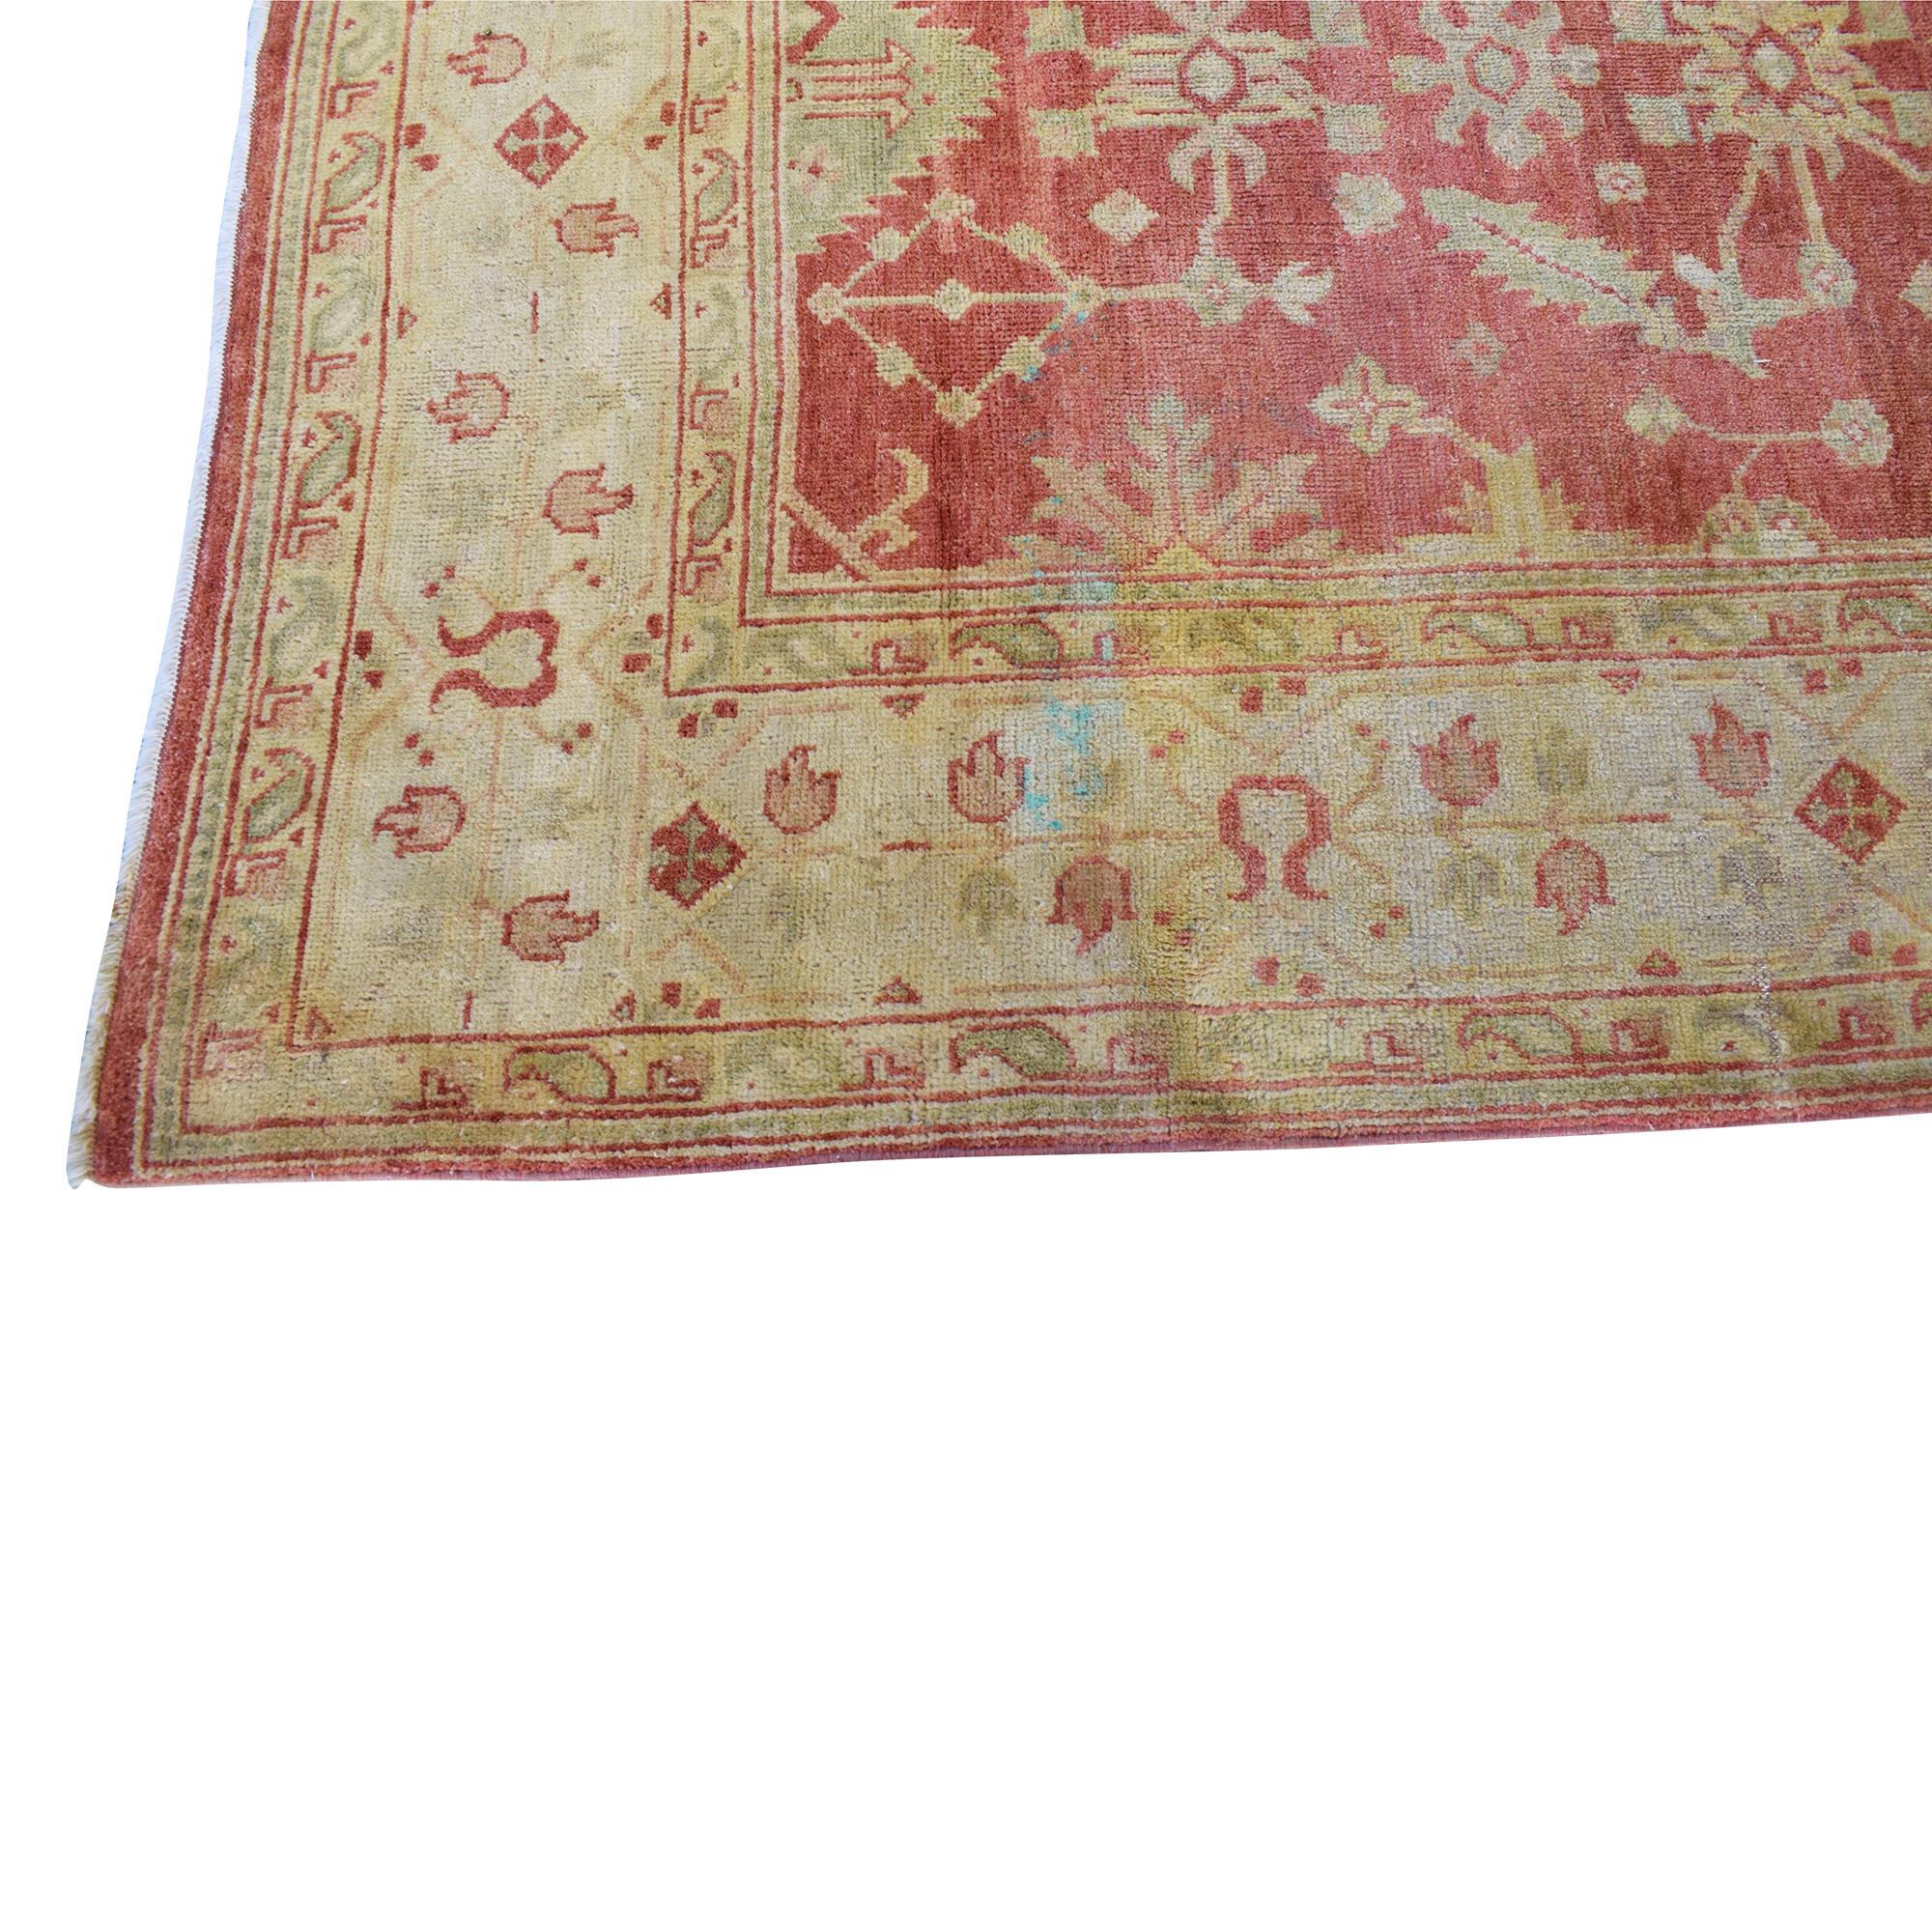 ABC Carpet & Home ABC Carpet & Home Area Rug multi